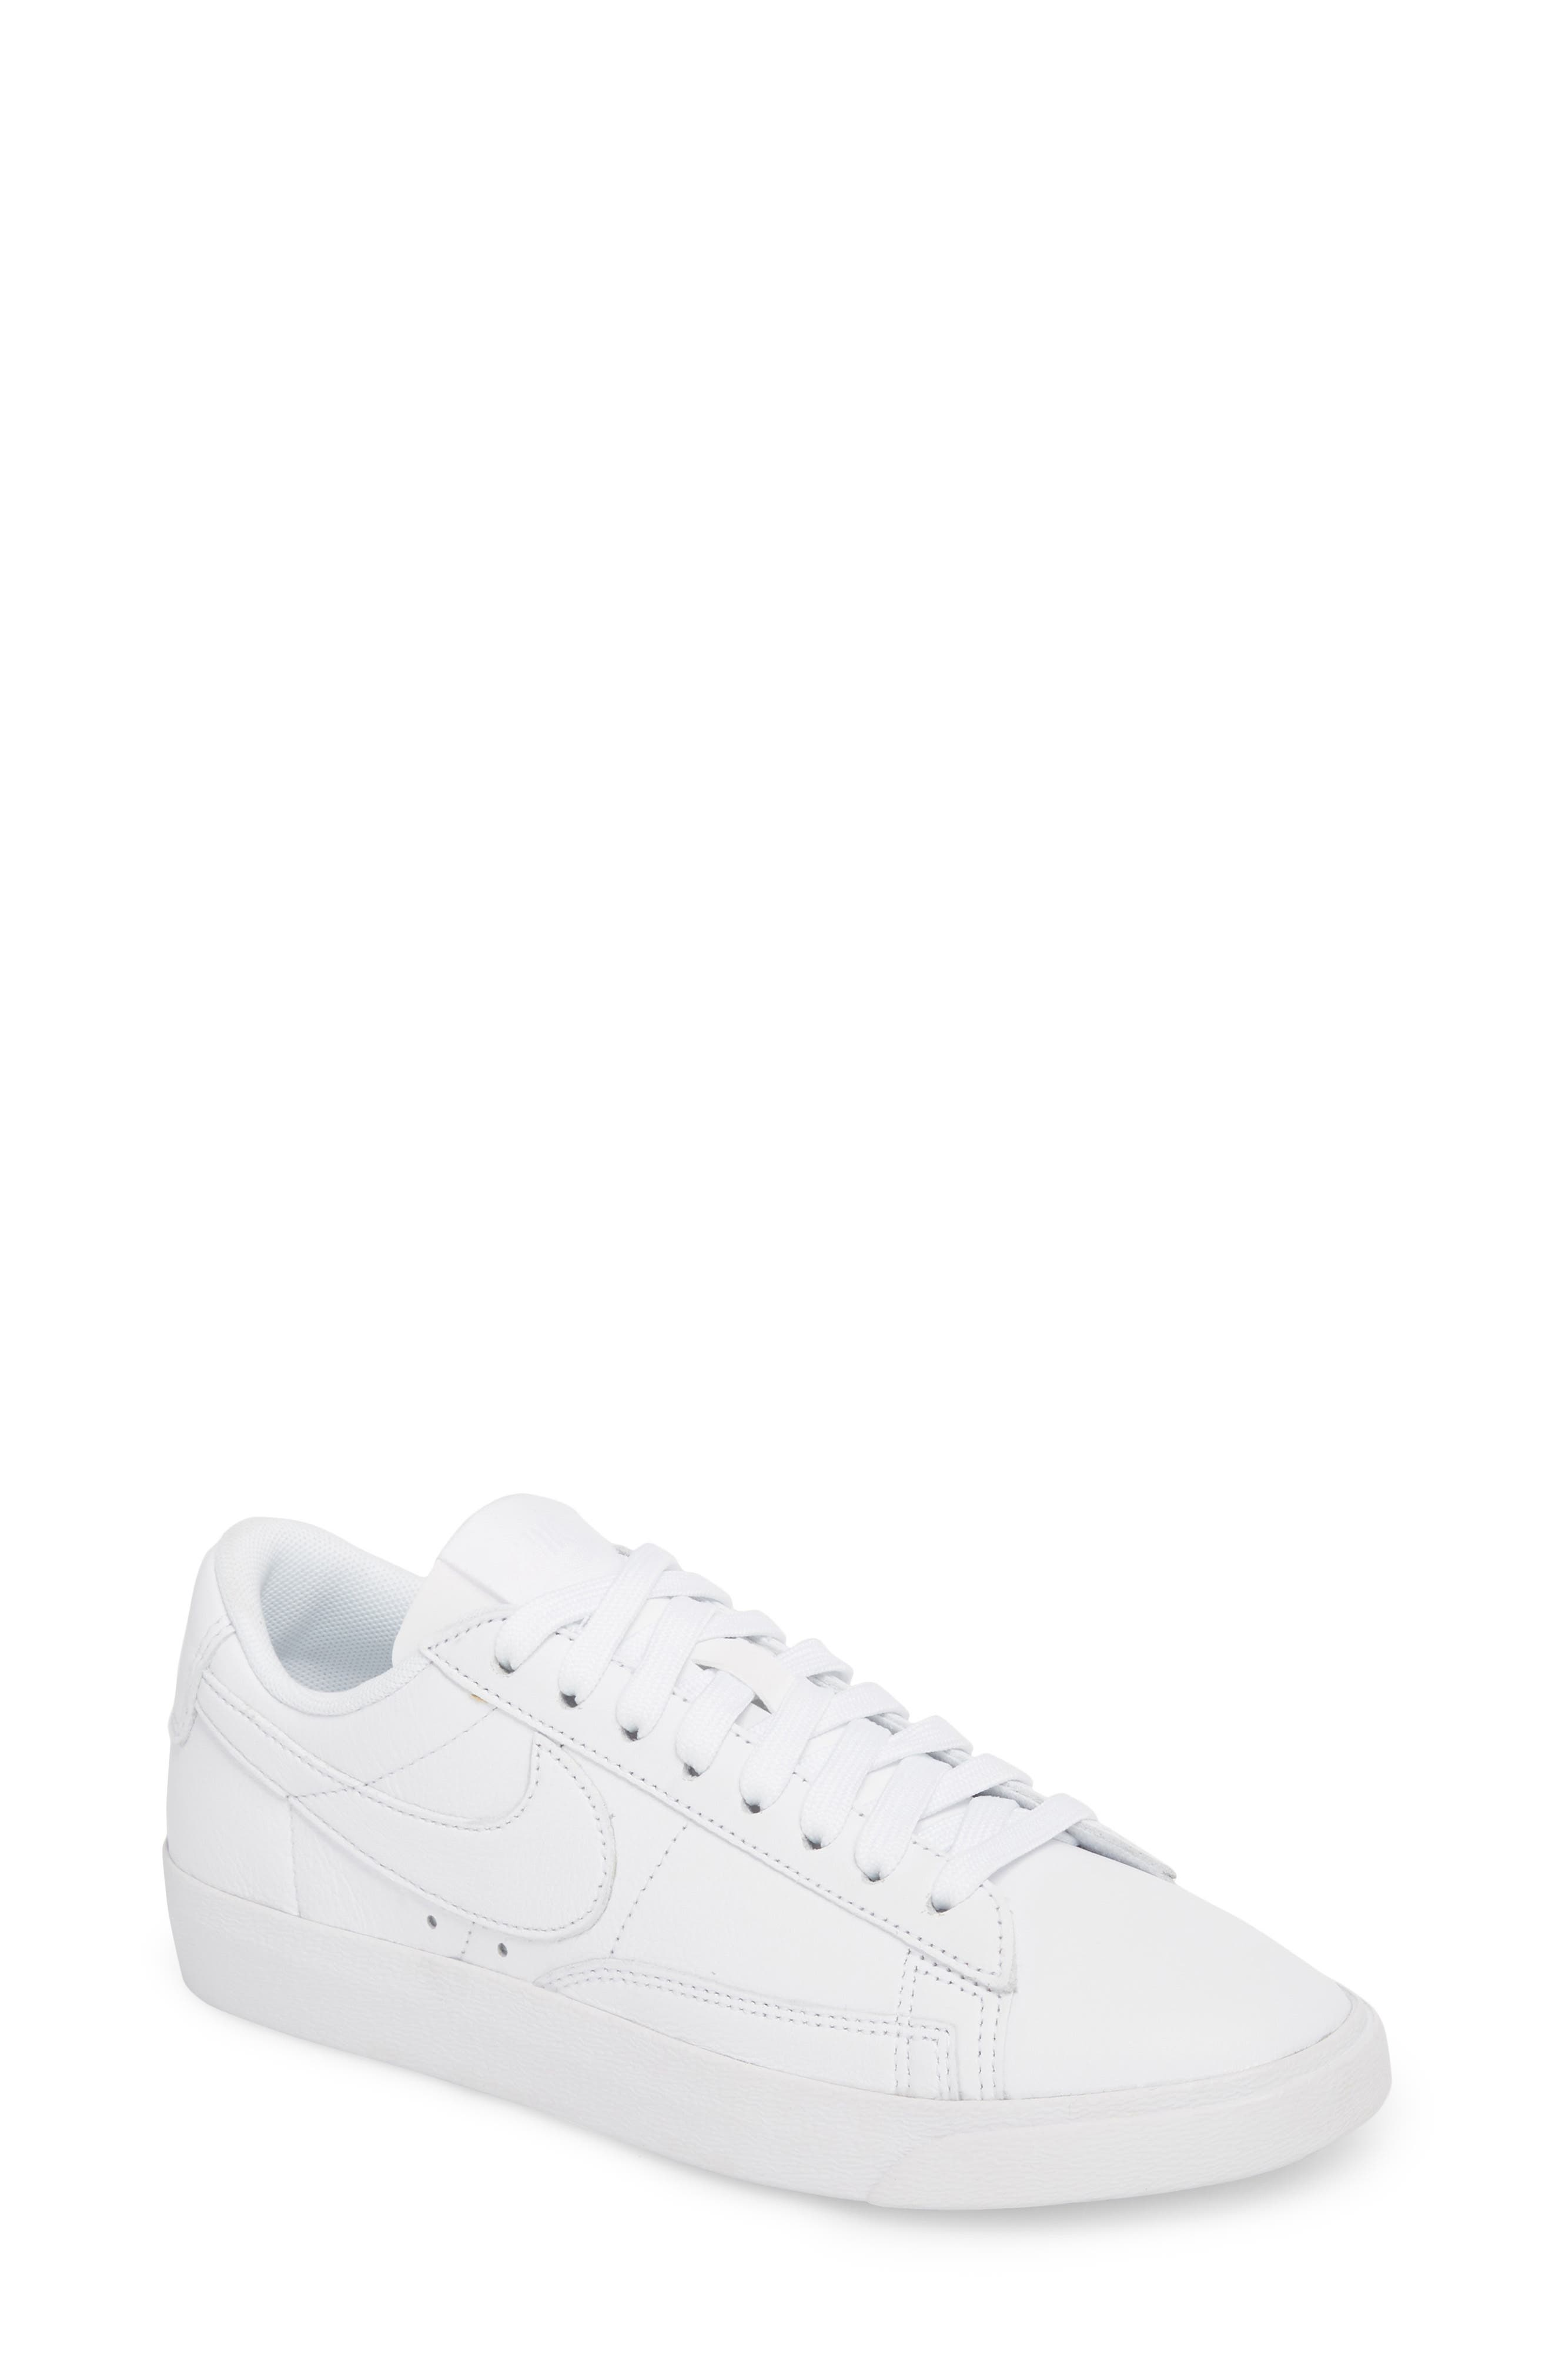 Blazer Low LE Sneaker,                         Main,                         color, 104